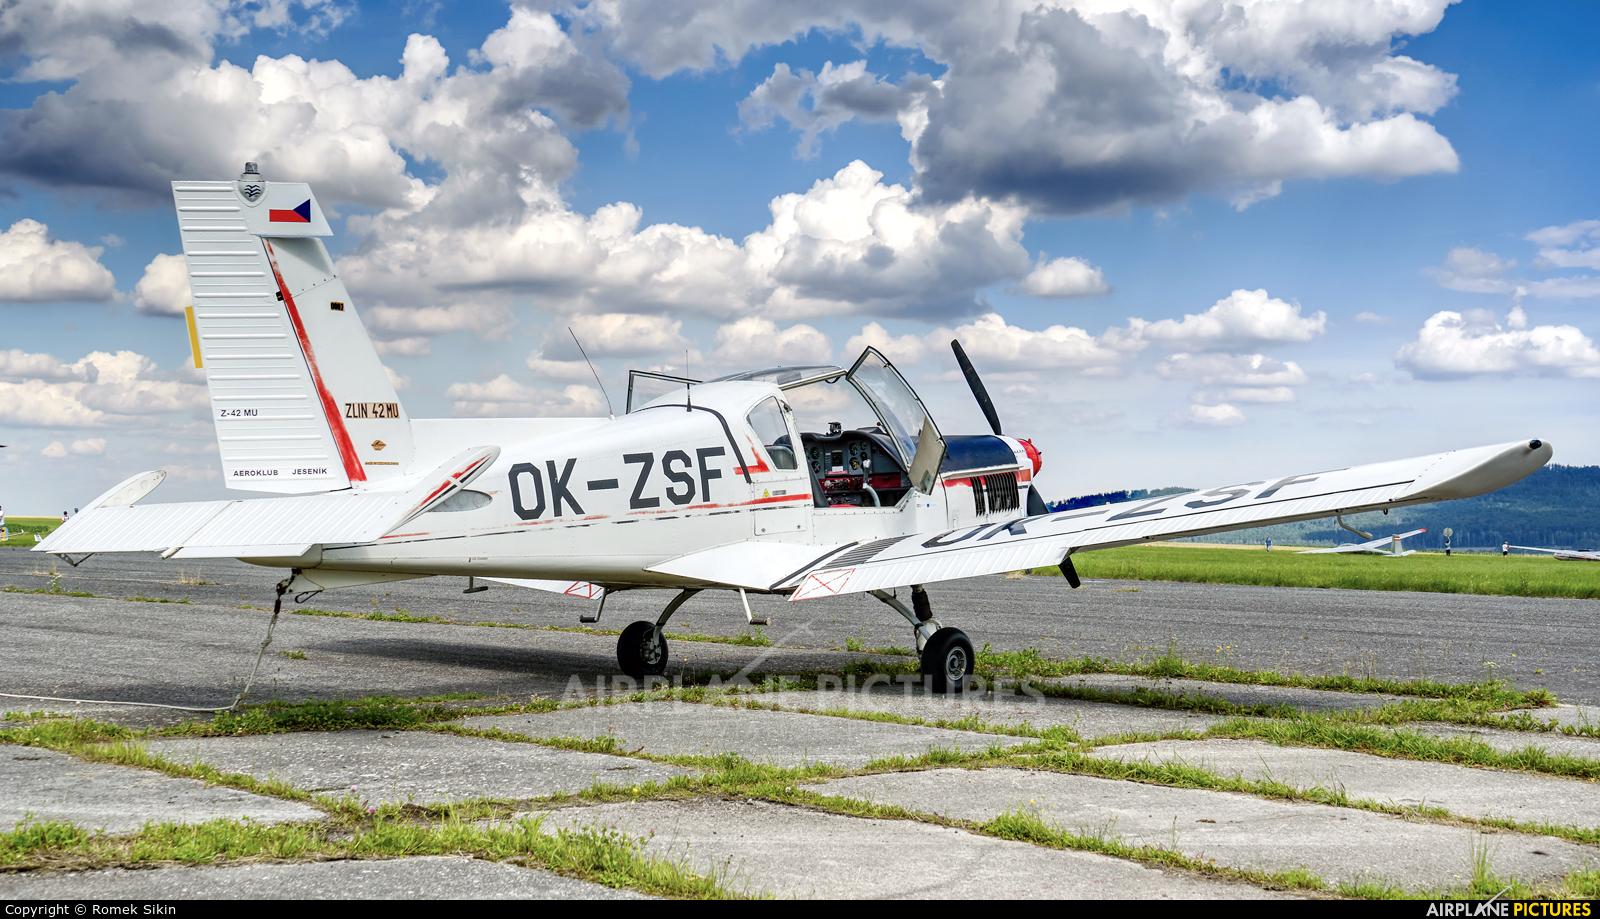 Aeroklub Jeseník OK-ZSF aircraft at Mikulovice